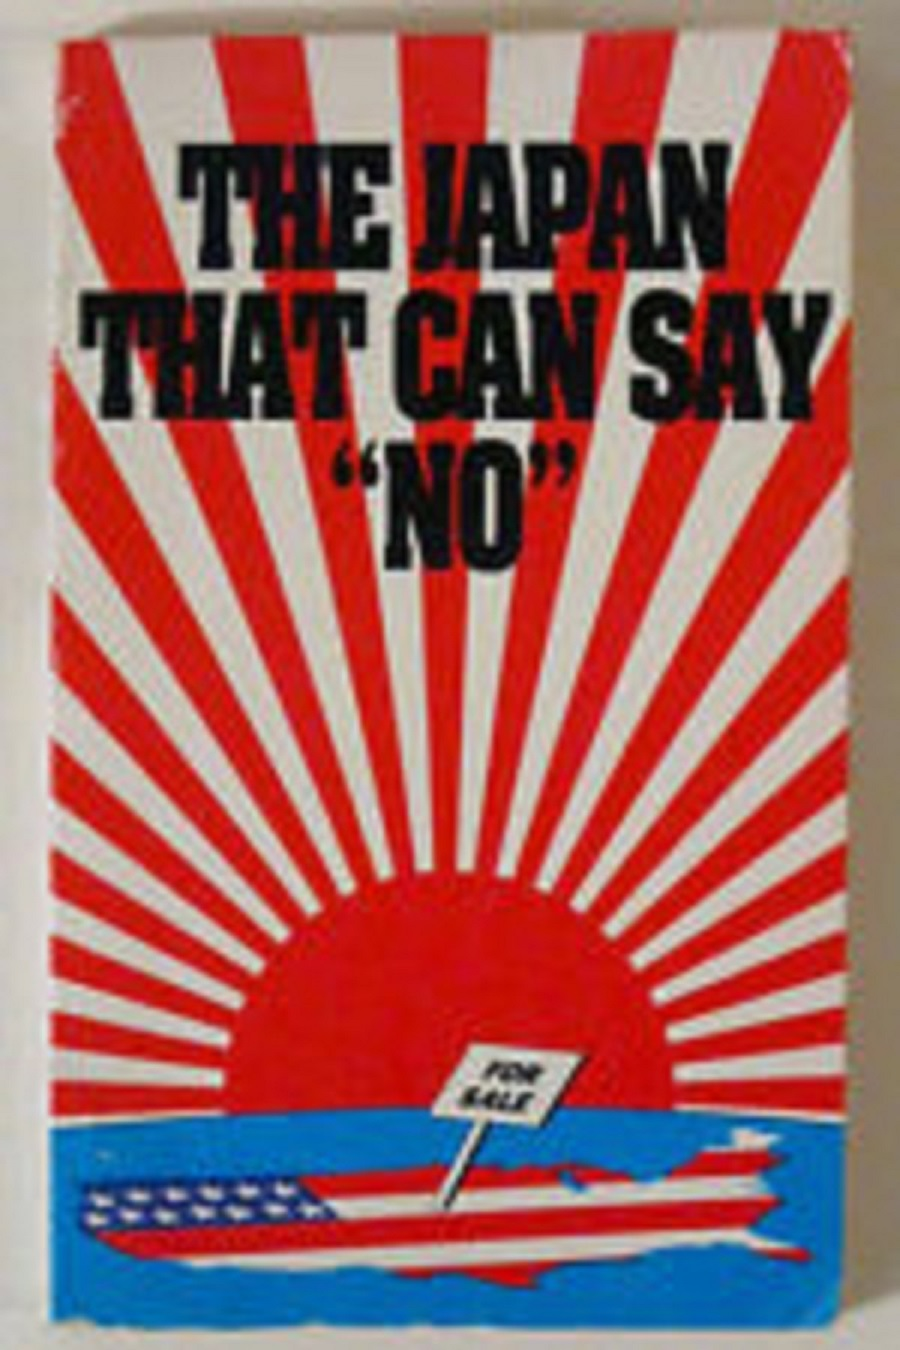 Japan-can-say-no-nbmn-jklm.jpg